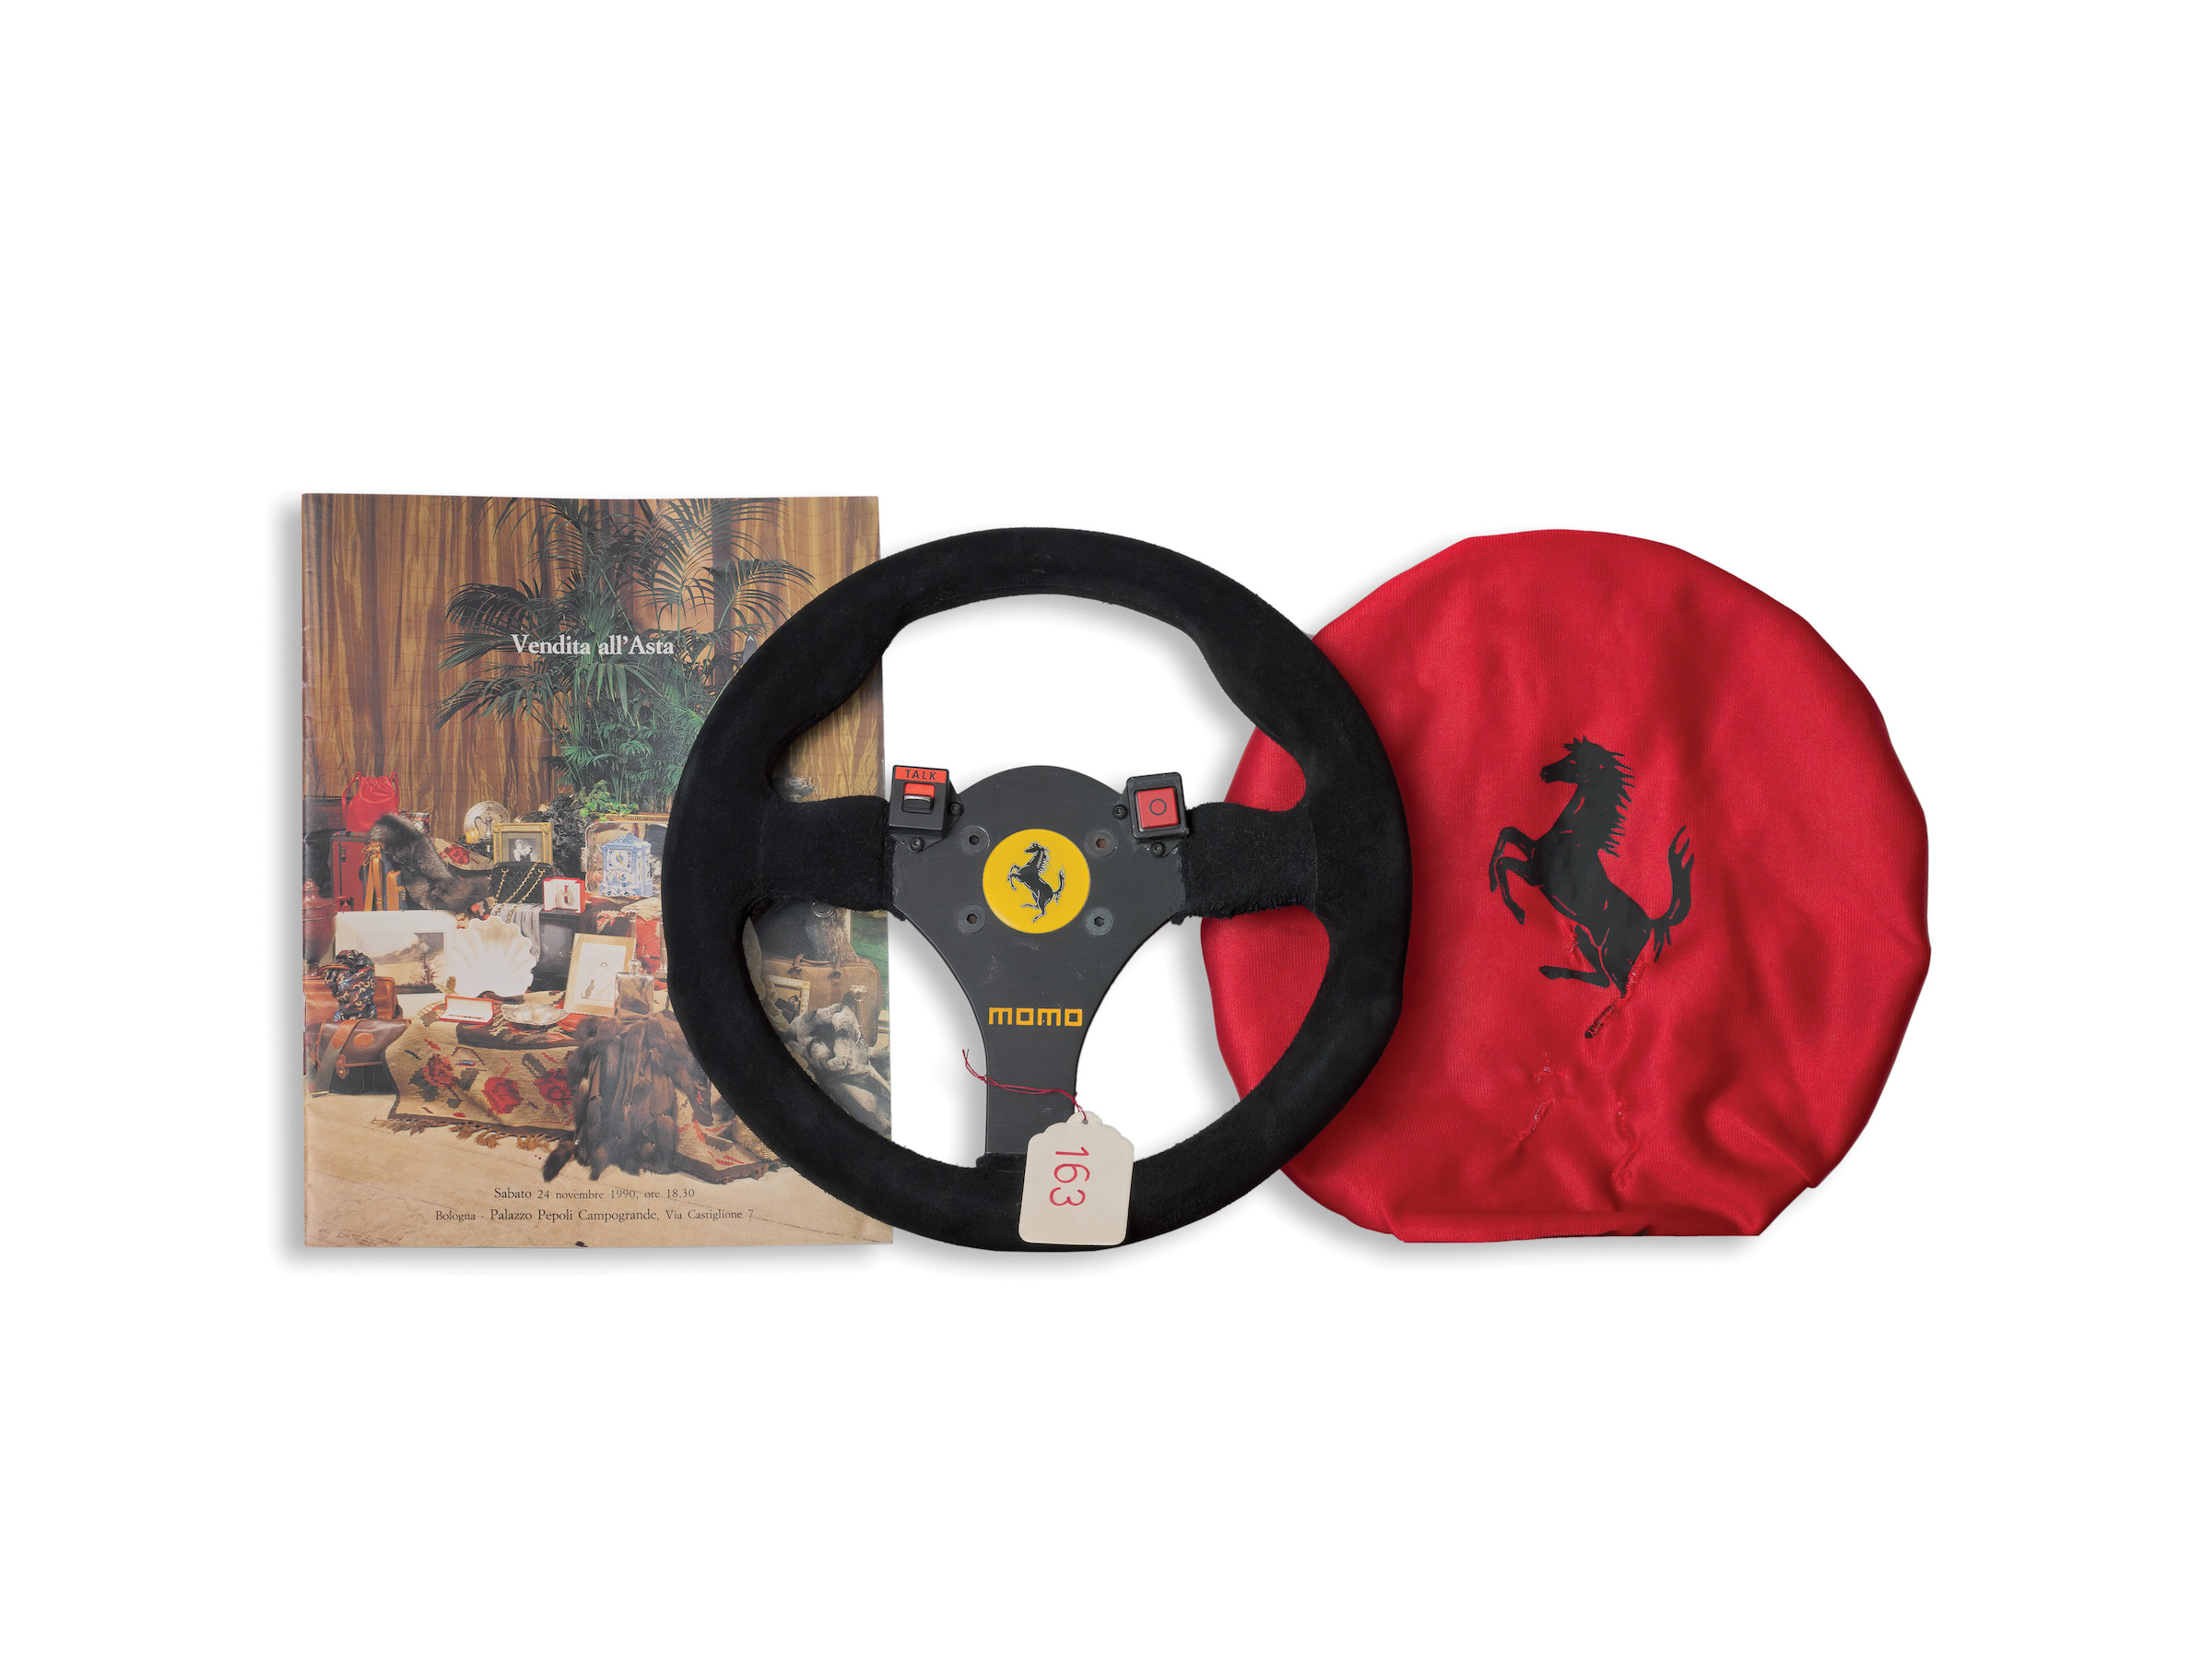 Ferrari 641 Formula 1 MOMO Steering Wheel